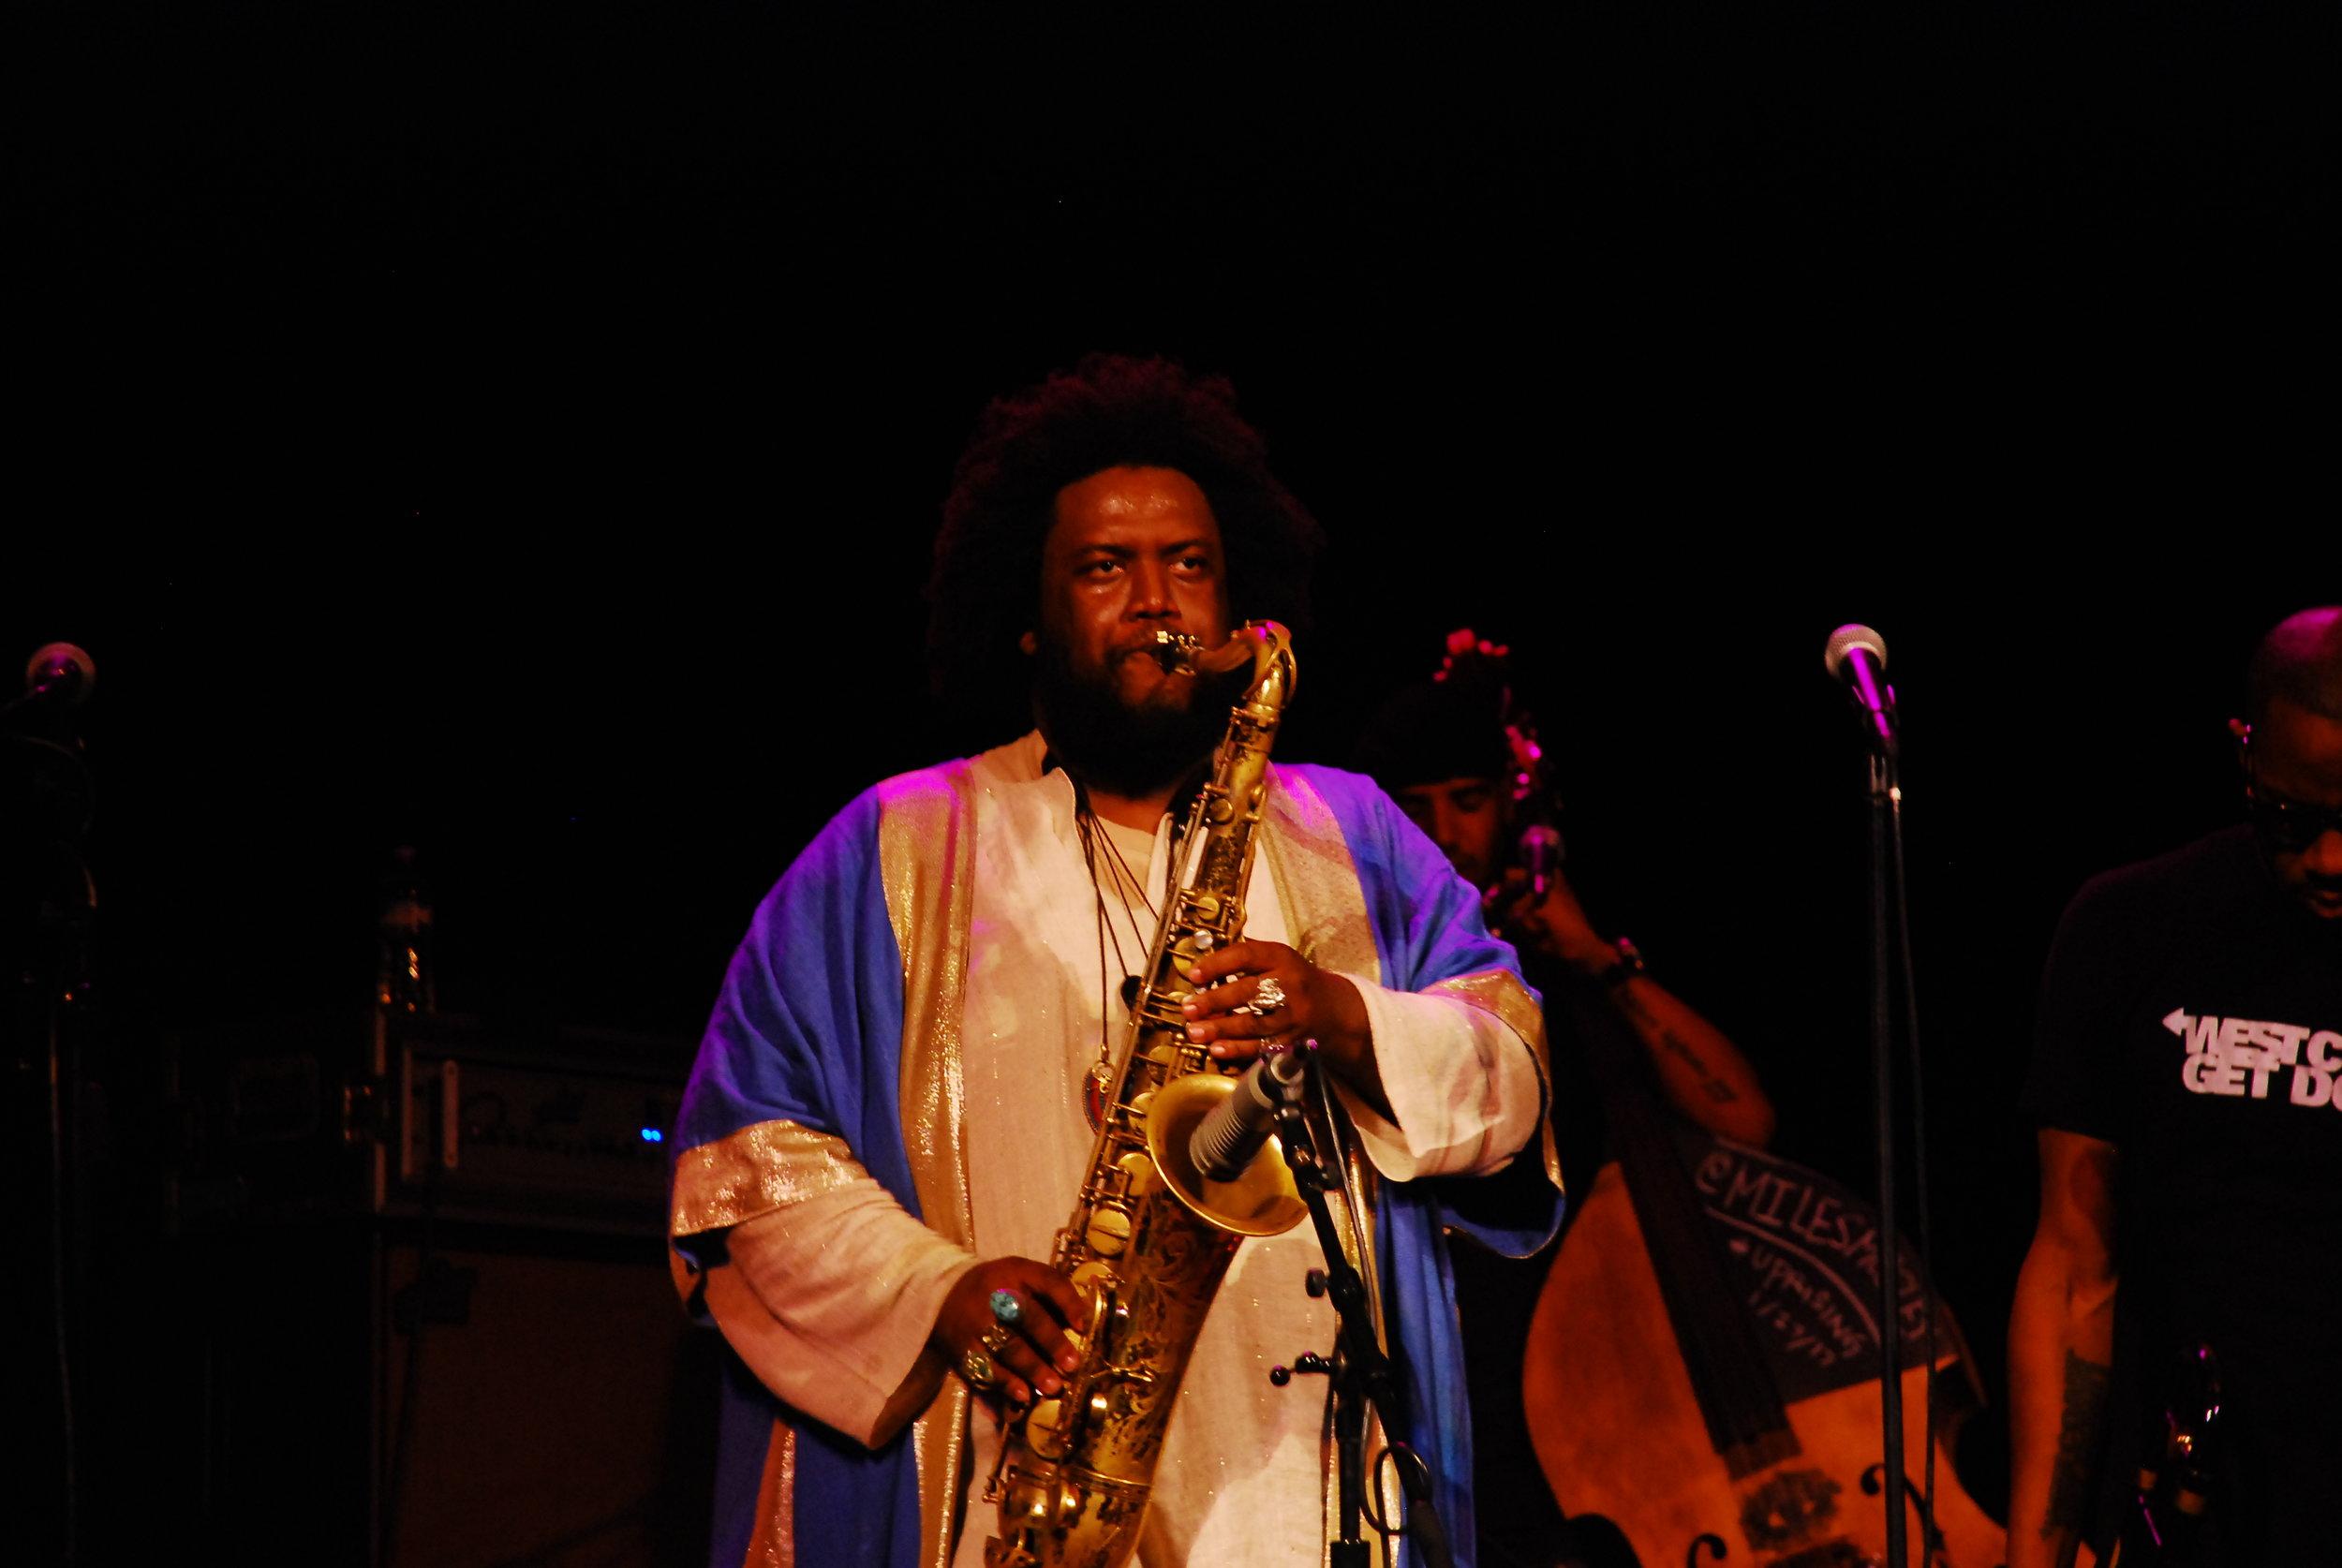 Kamasi Washington (Tenor Saxophone) performing with The Next Step.